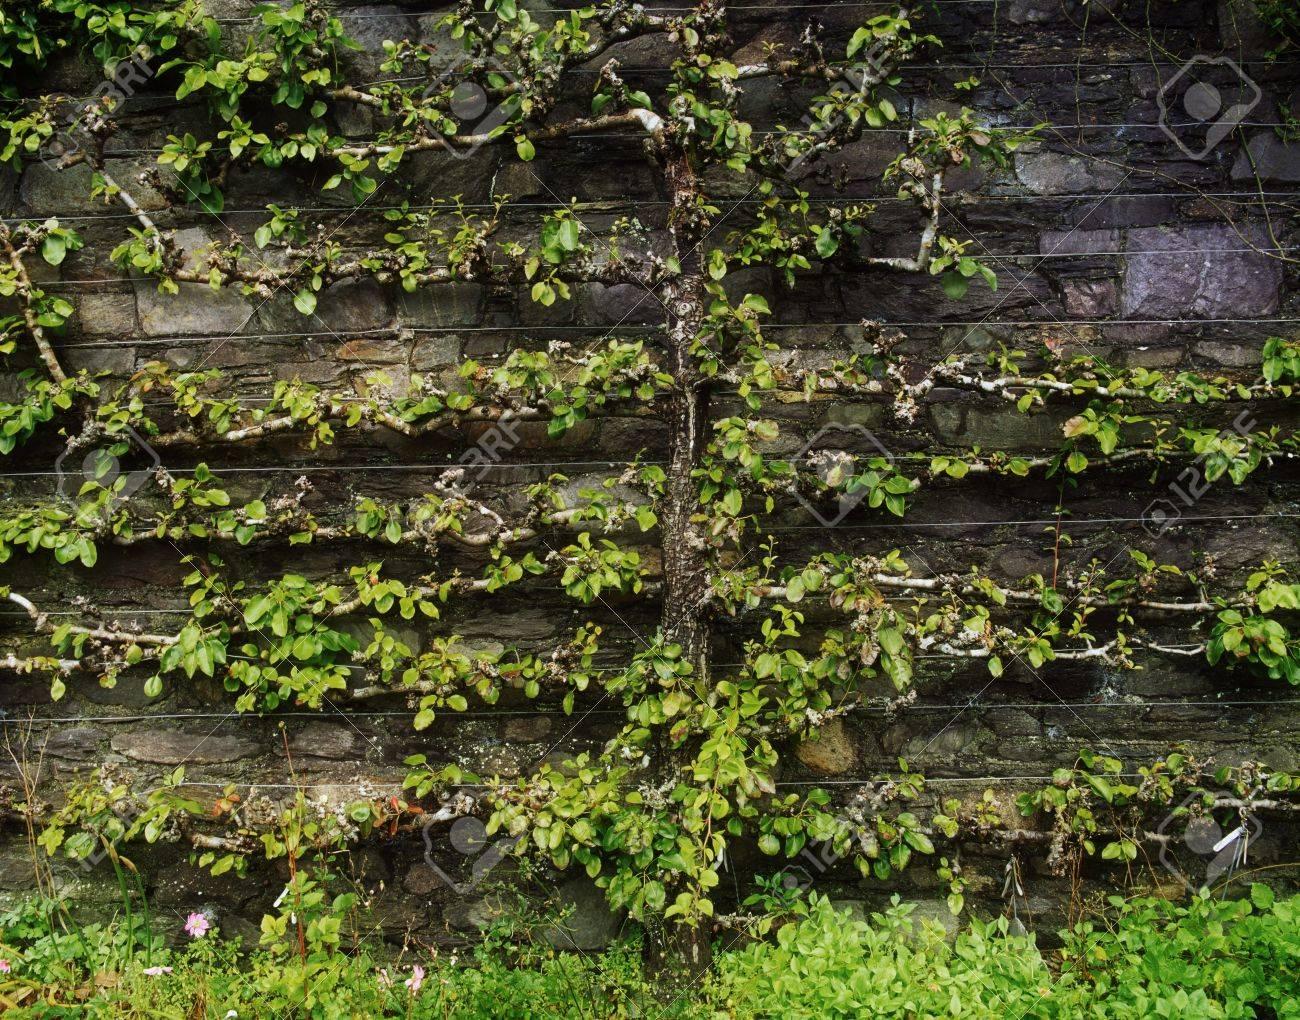 Espaliered Apple Tree Stock Photo - 7188044